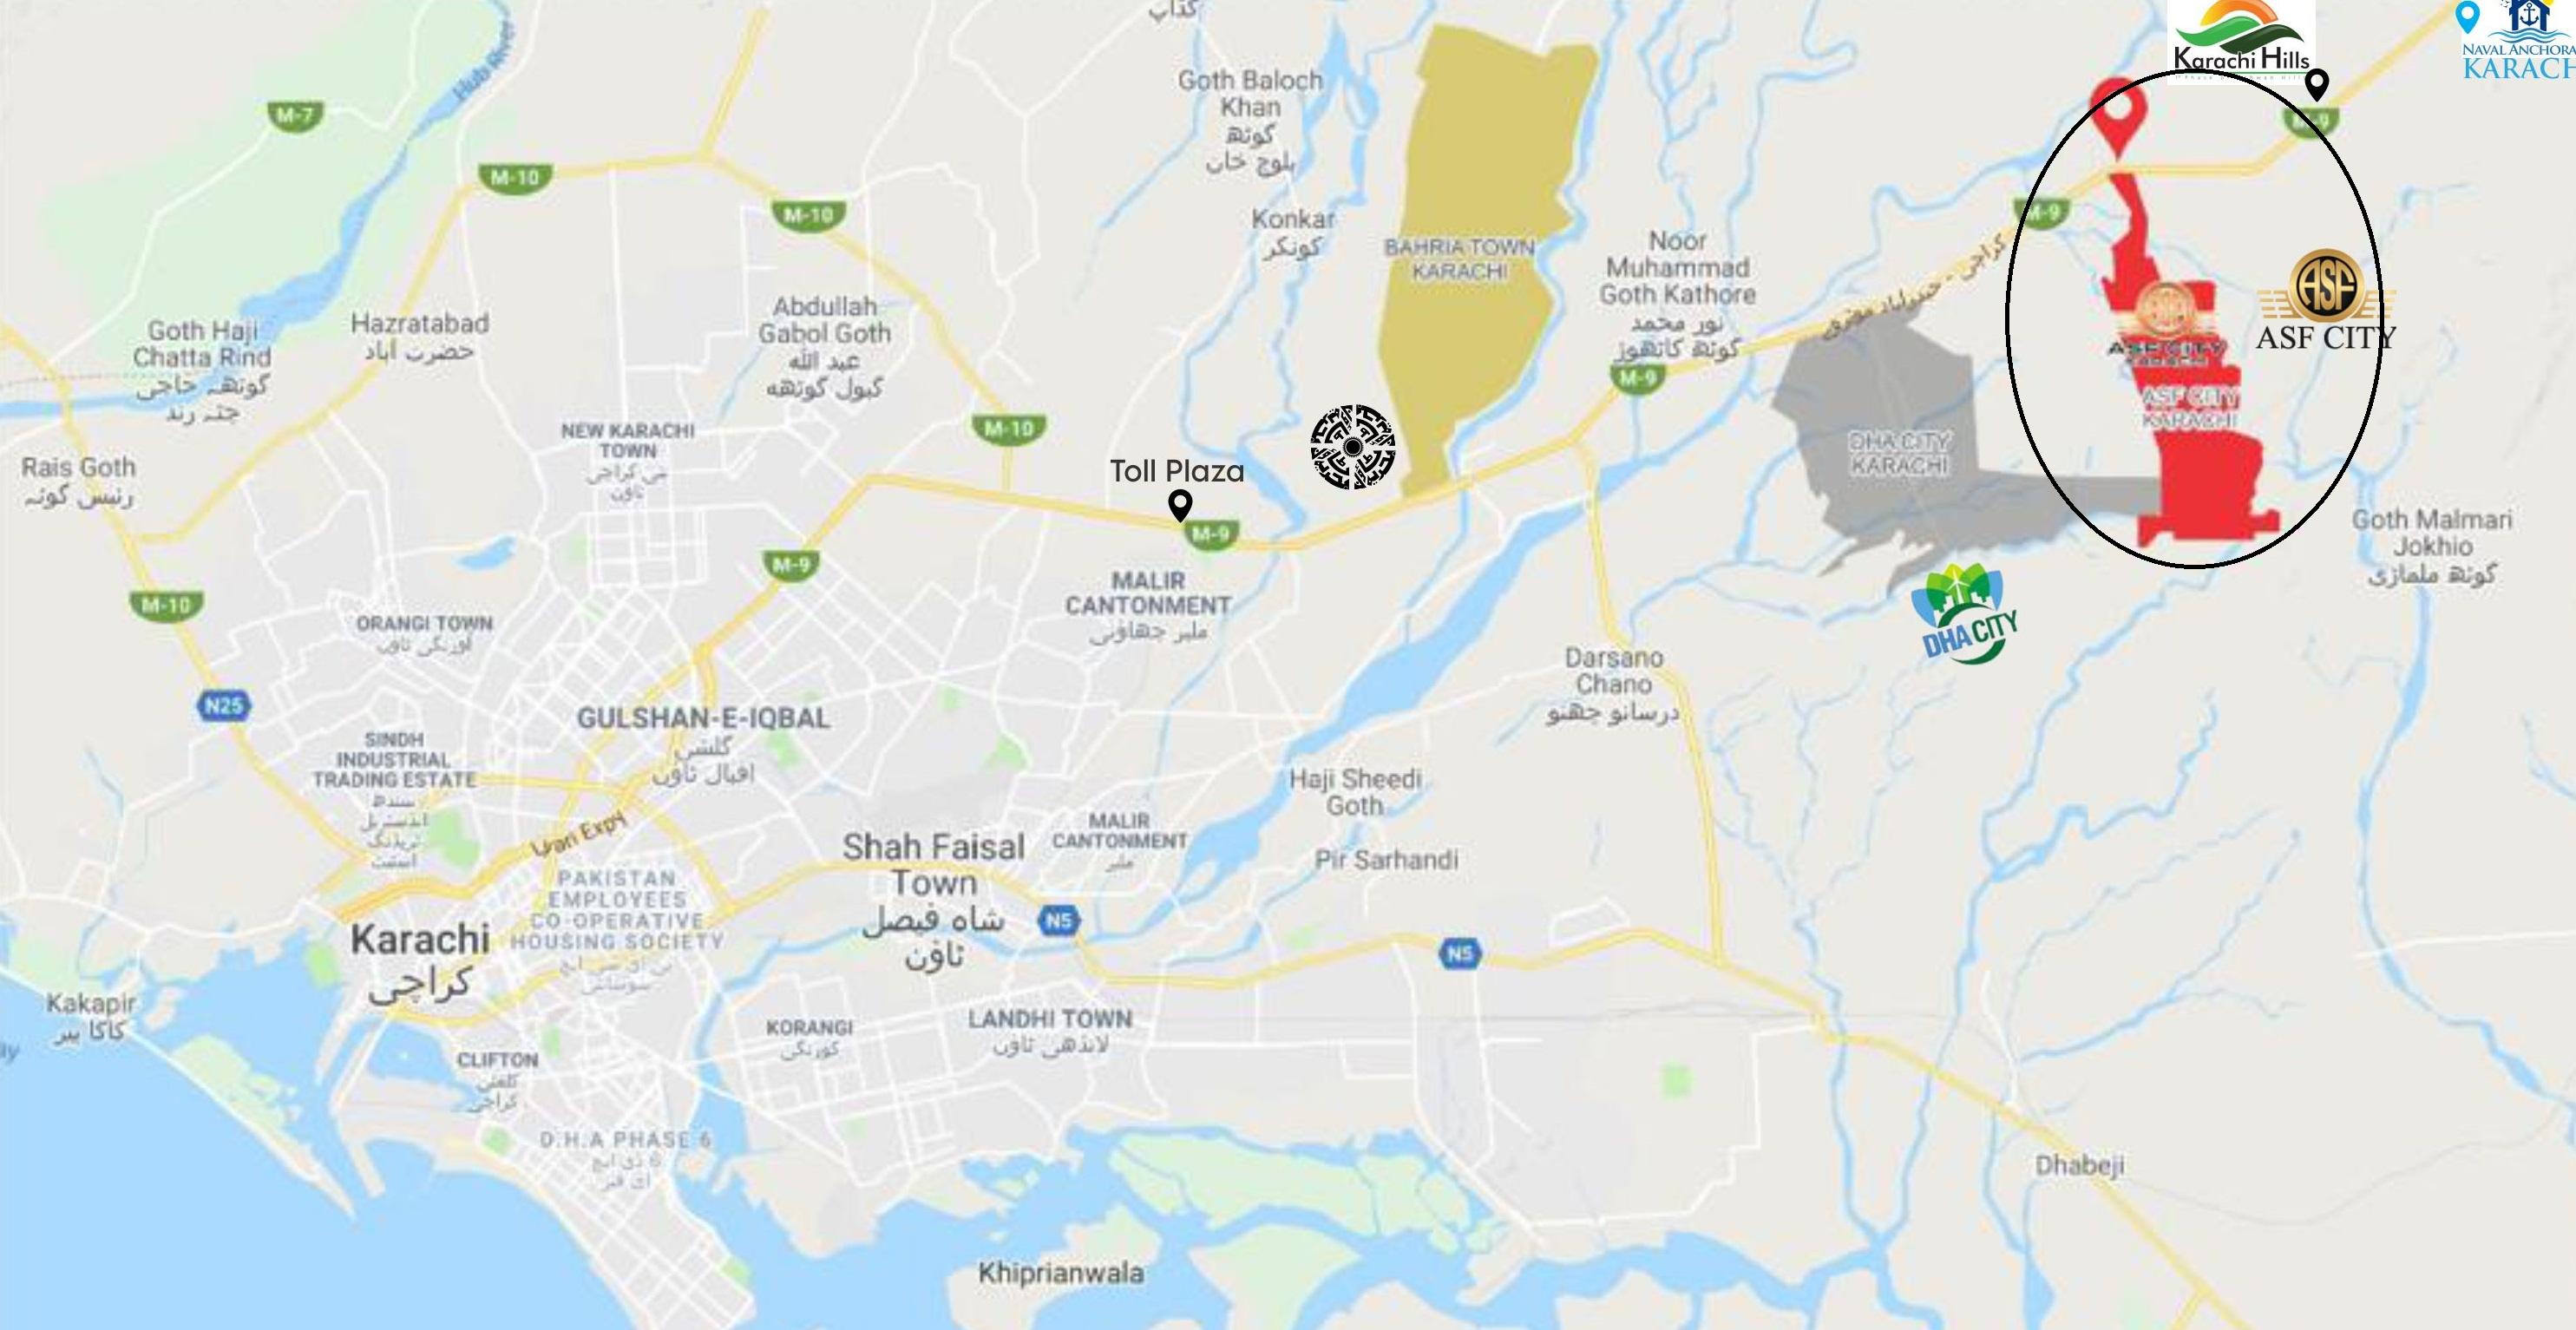 ASF City Karachi Location Map